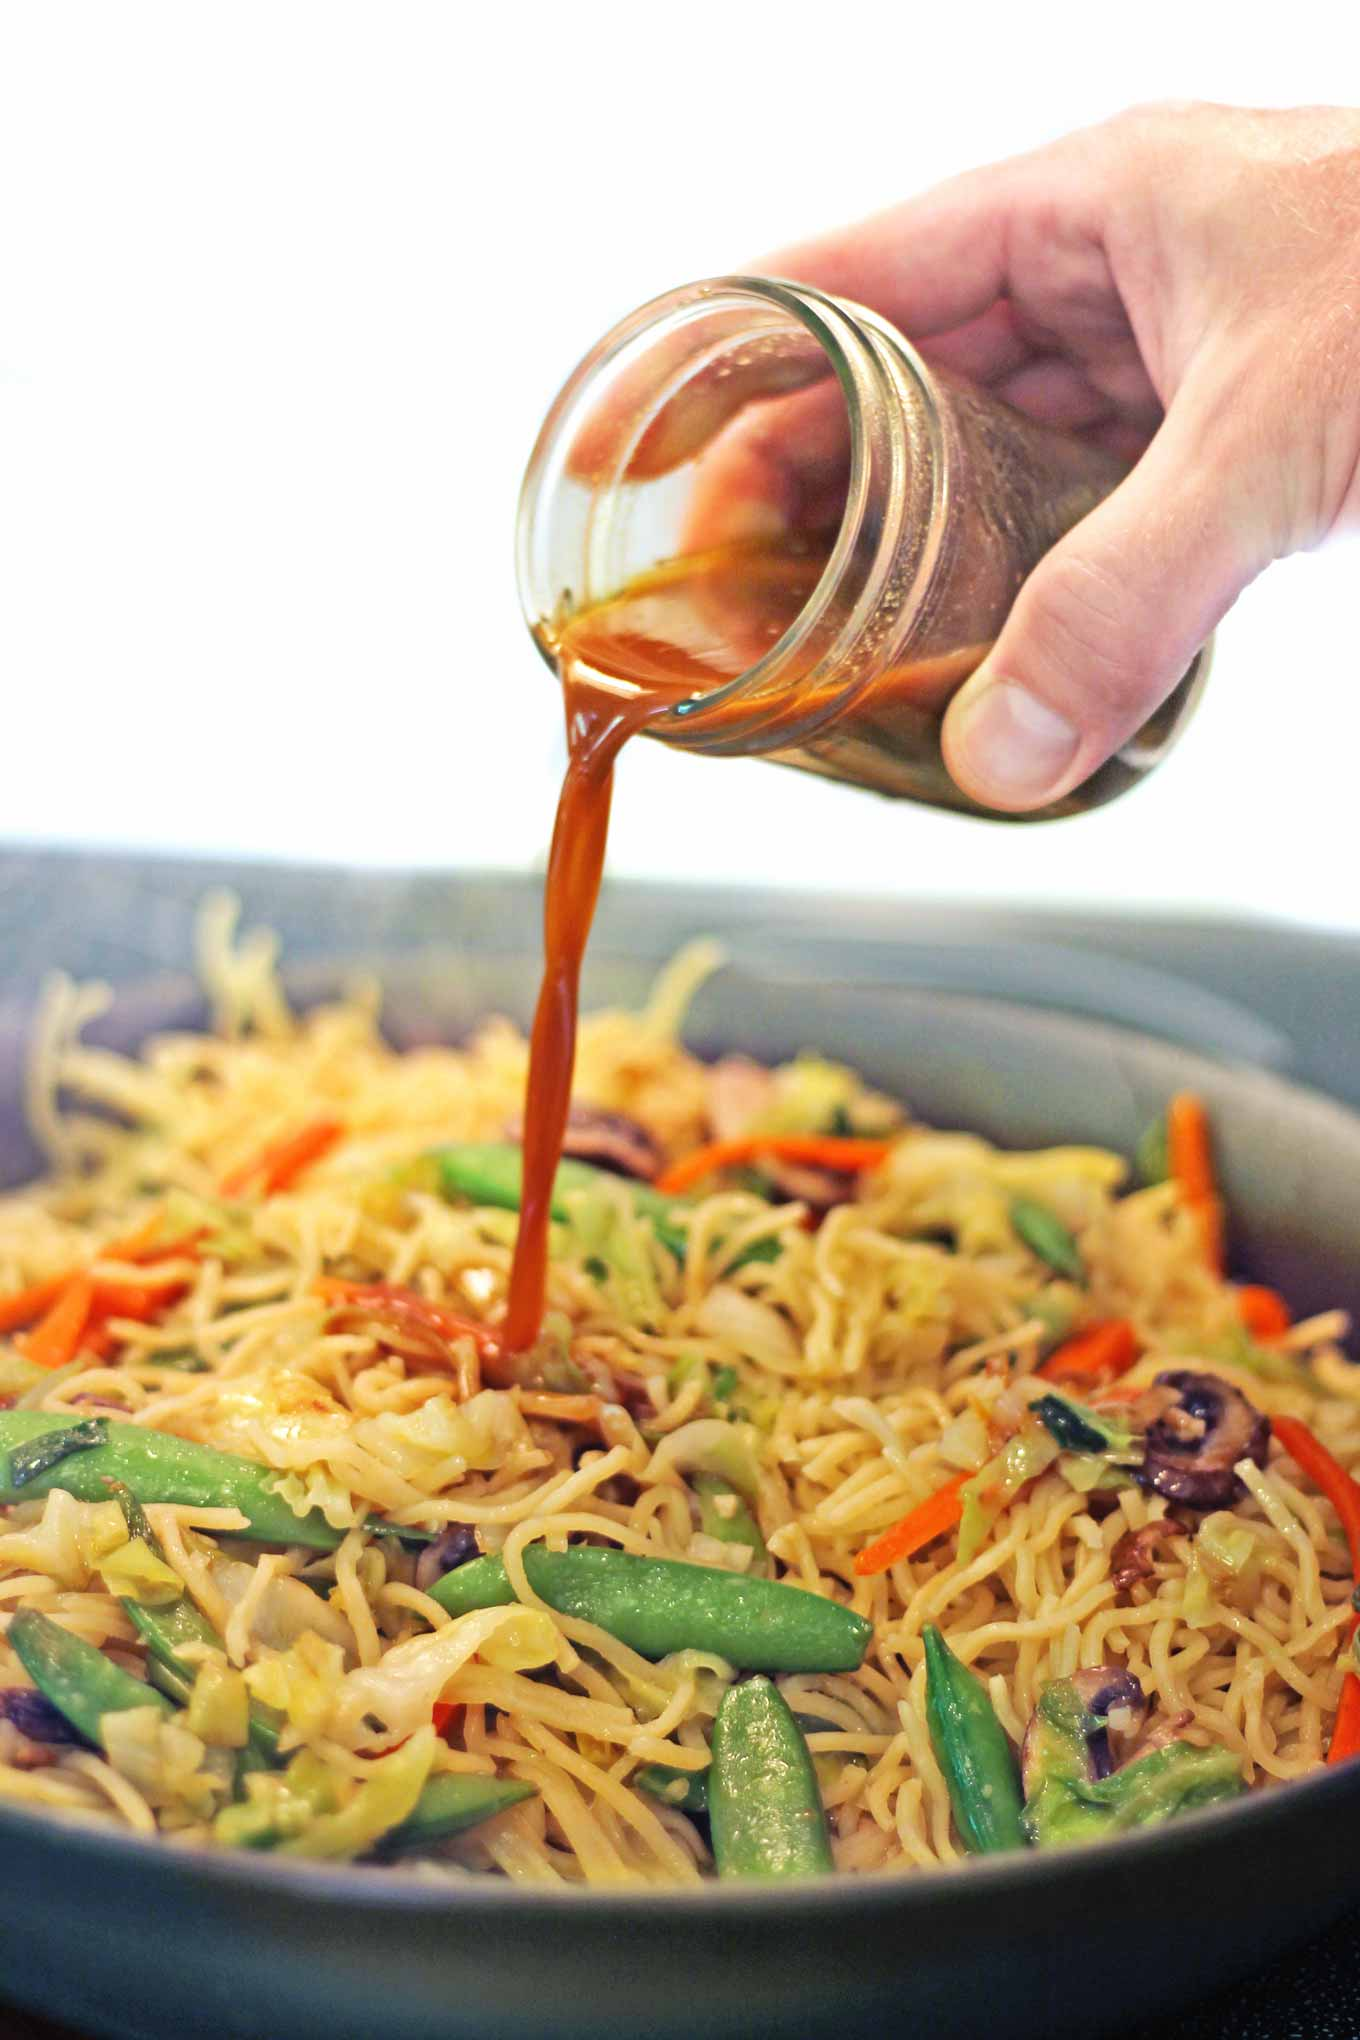 pouring stir fry sauce